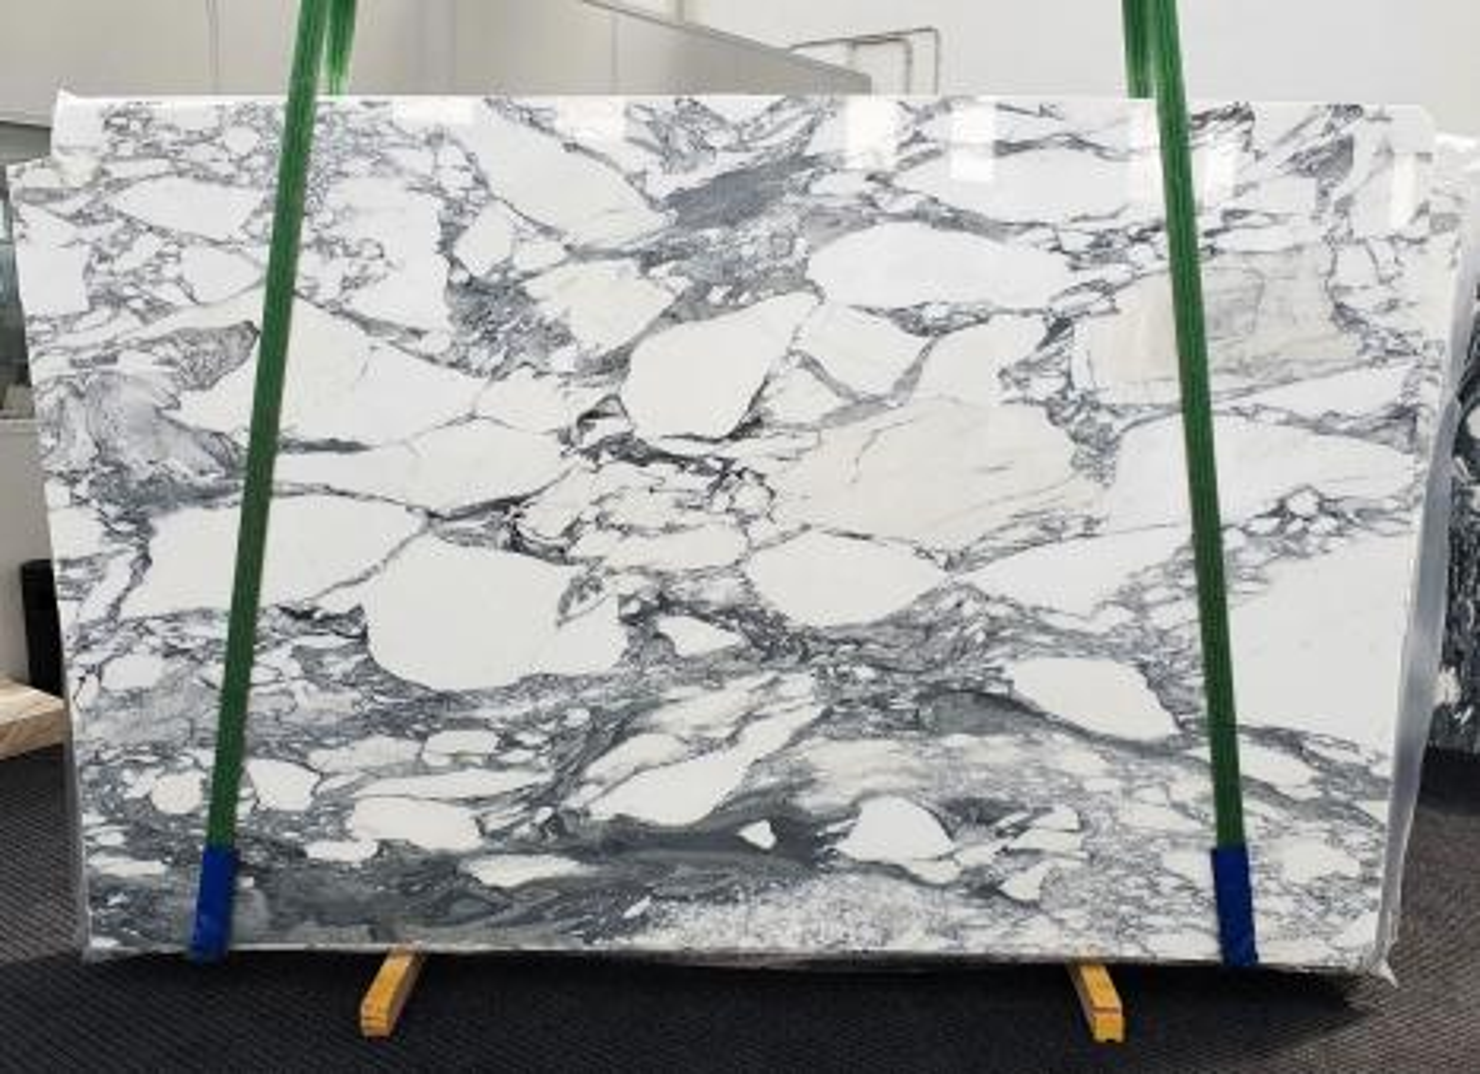 ARABESCATO CORCHIA Supply Veneto (Italy) polished slabs 1433 , Slab #35 natural marble